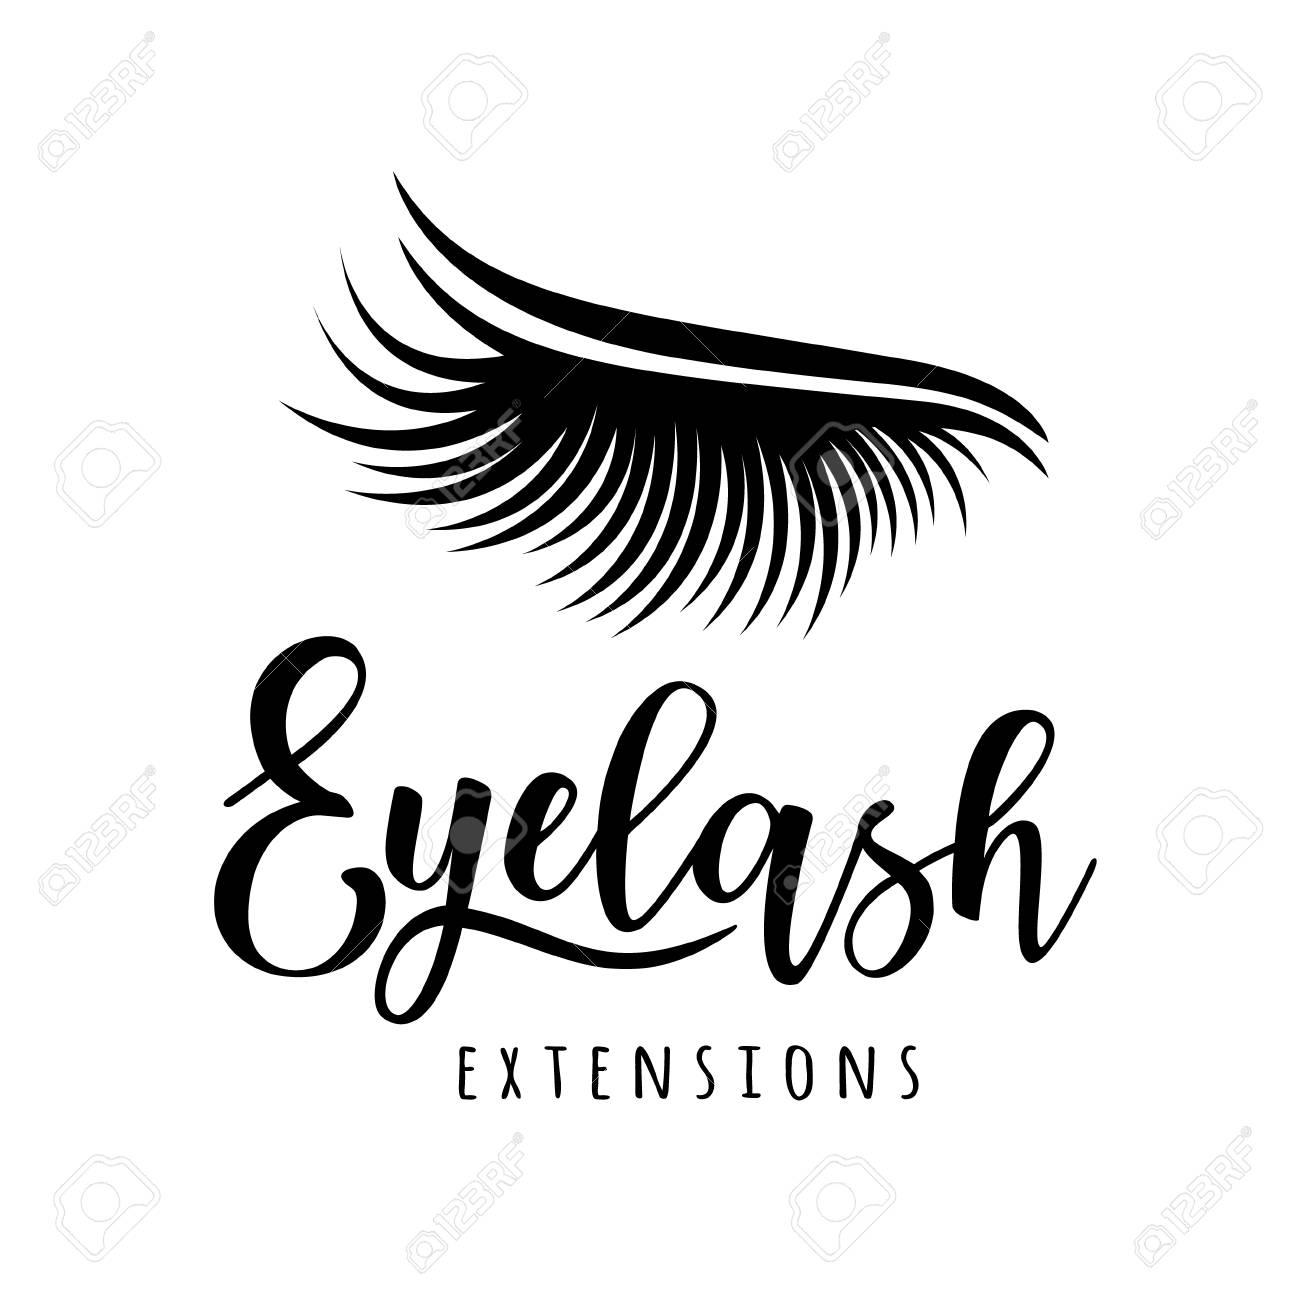 f8a056fec26 Eyelash extension logo. Vector illustration of lashes. For beauty salon, lash  extensions maker